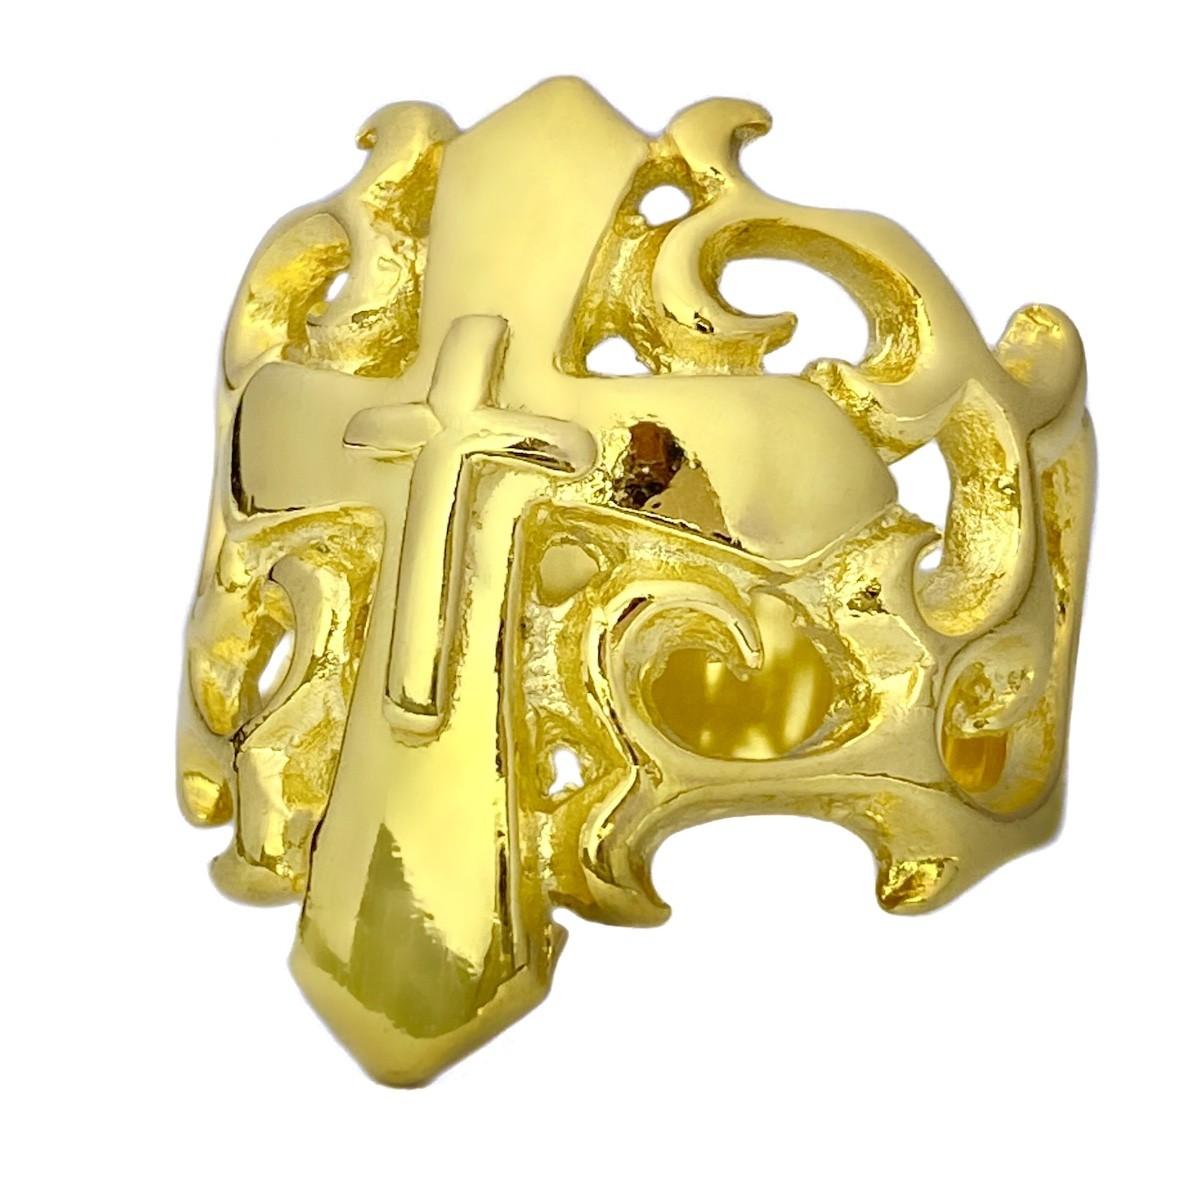 Anel Cruz Texturizada Relevo 9,5g (Banho Ouro 24k)